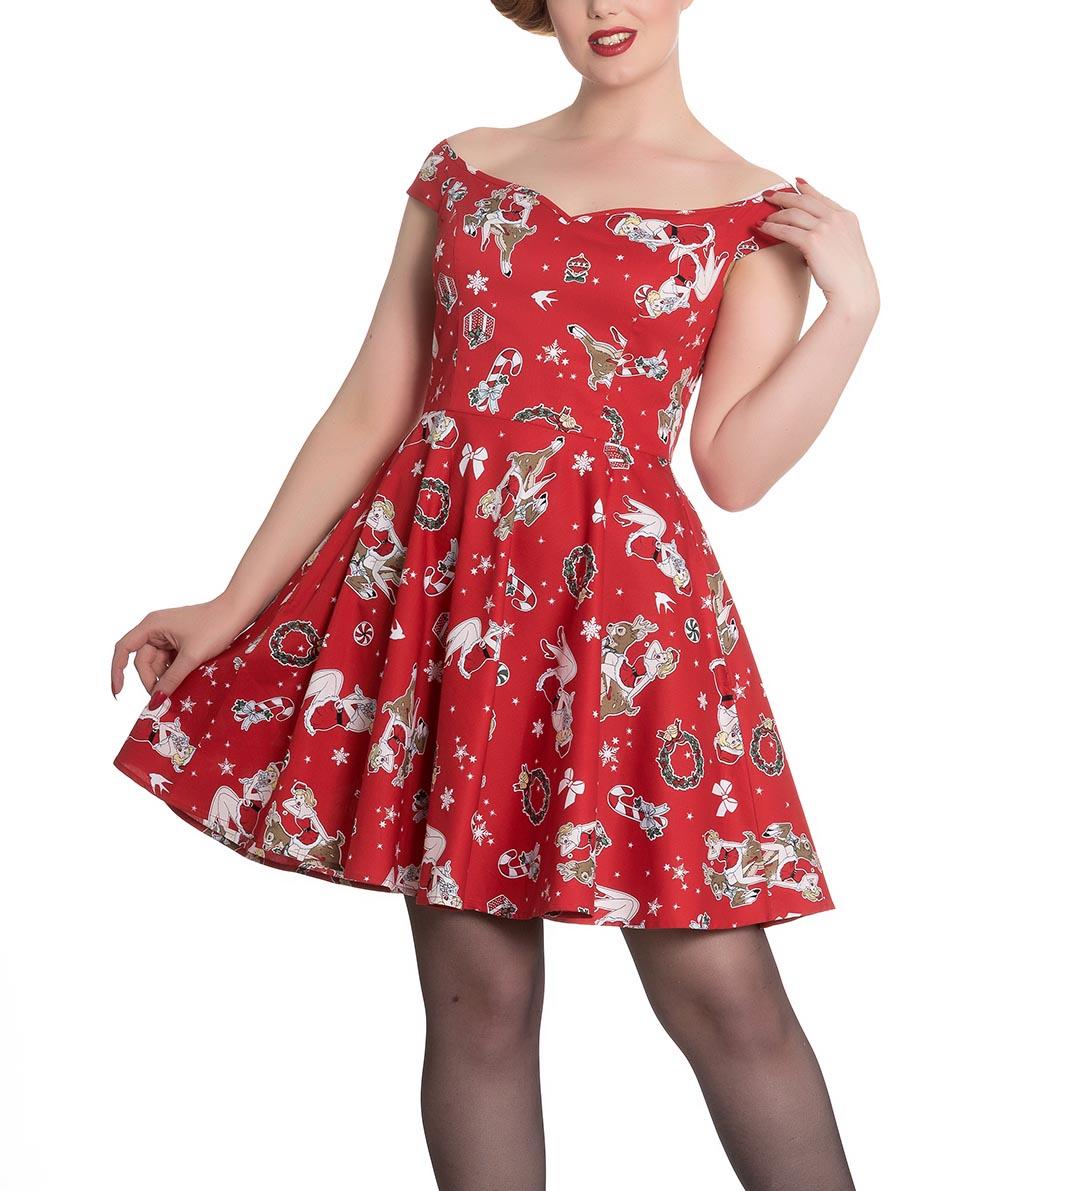 93d99bc766a6 Sentinel Hell Bunny Rockabilly Festive Noel Christmas Mini Dress BLITZEN  Red All Sizes